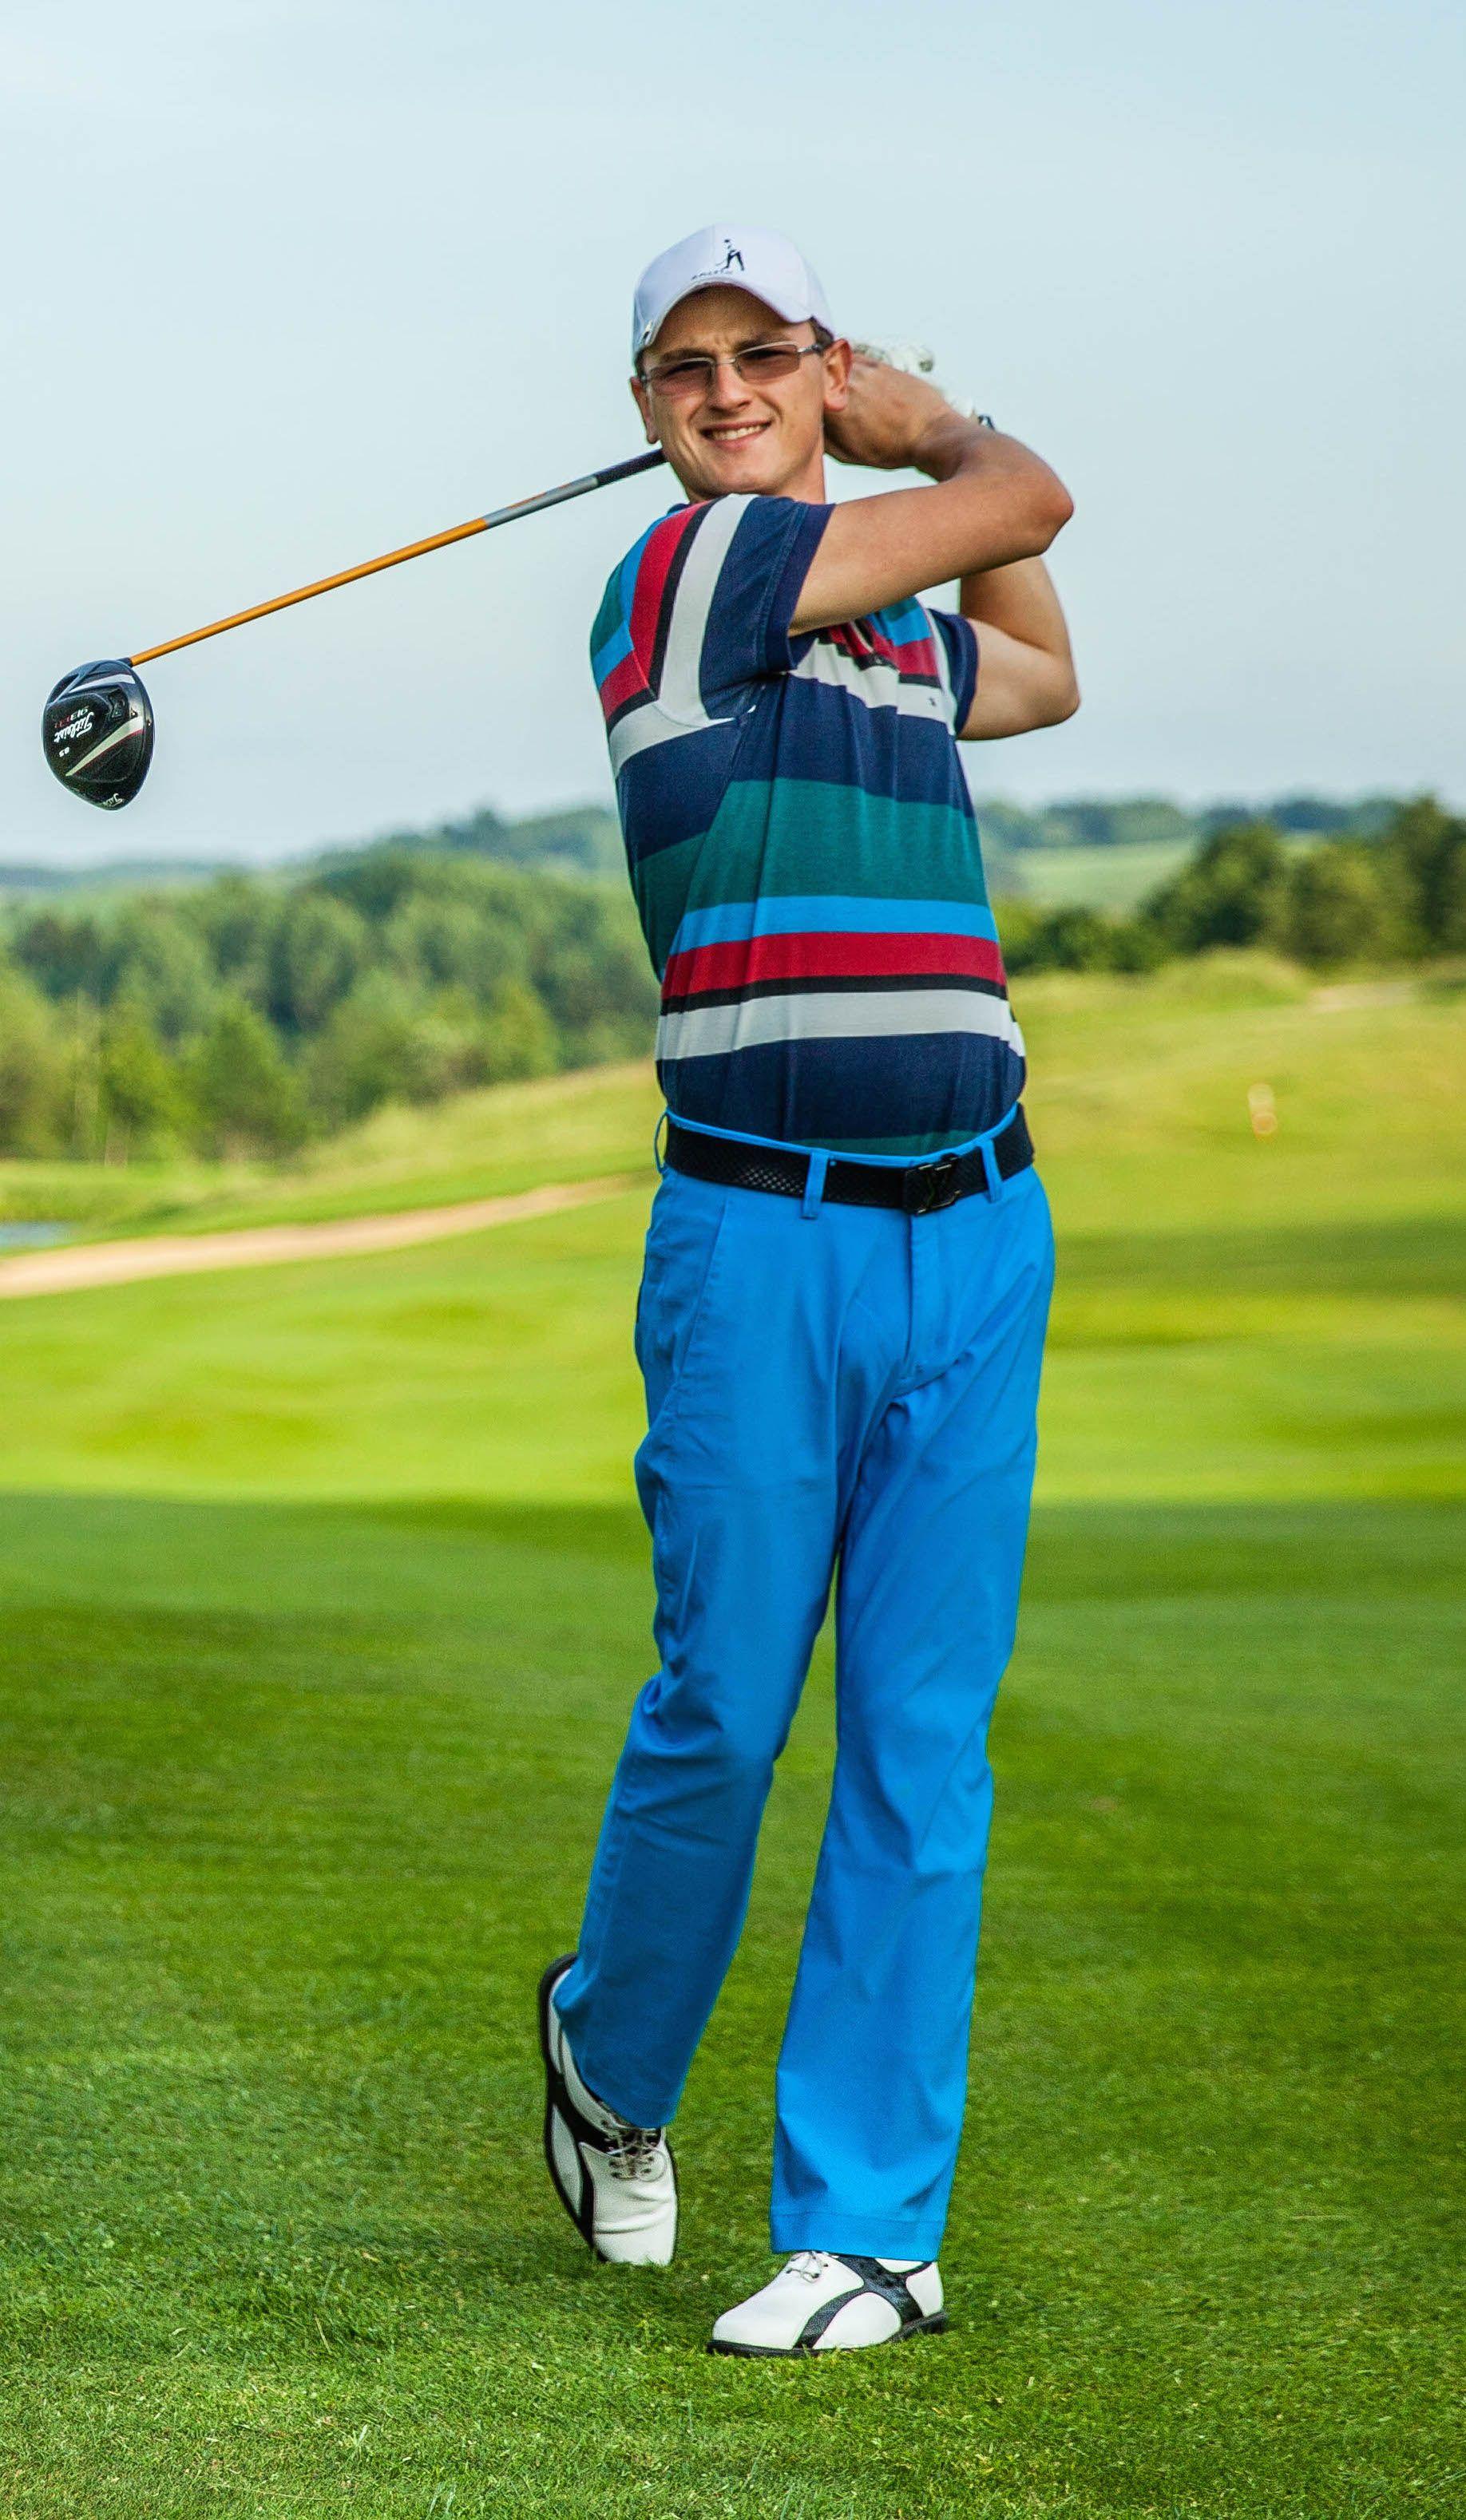 Pirmieji �ingsniai �aid�iant golf�